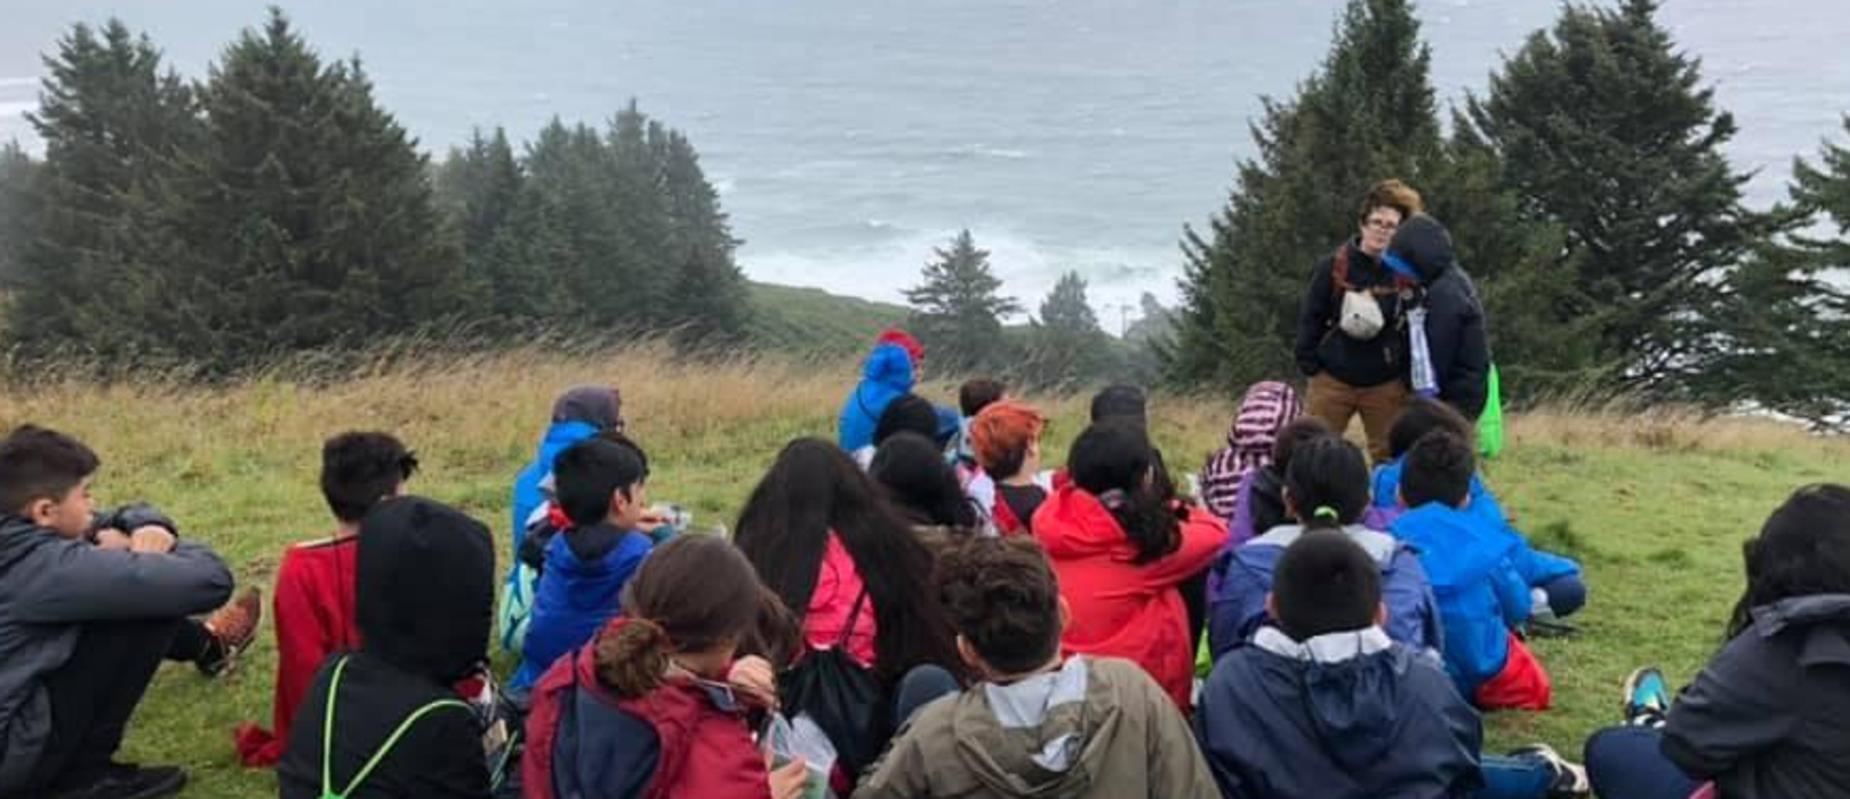 Students overlooking the coast at Outdoor School